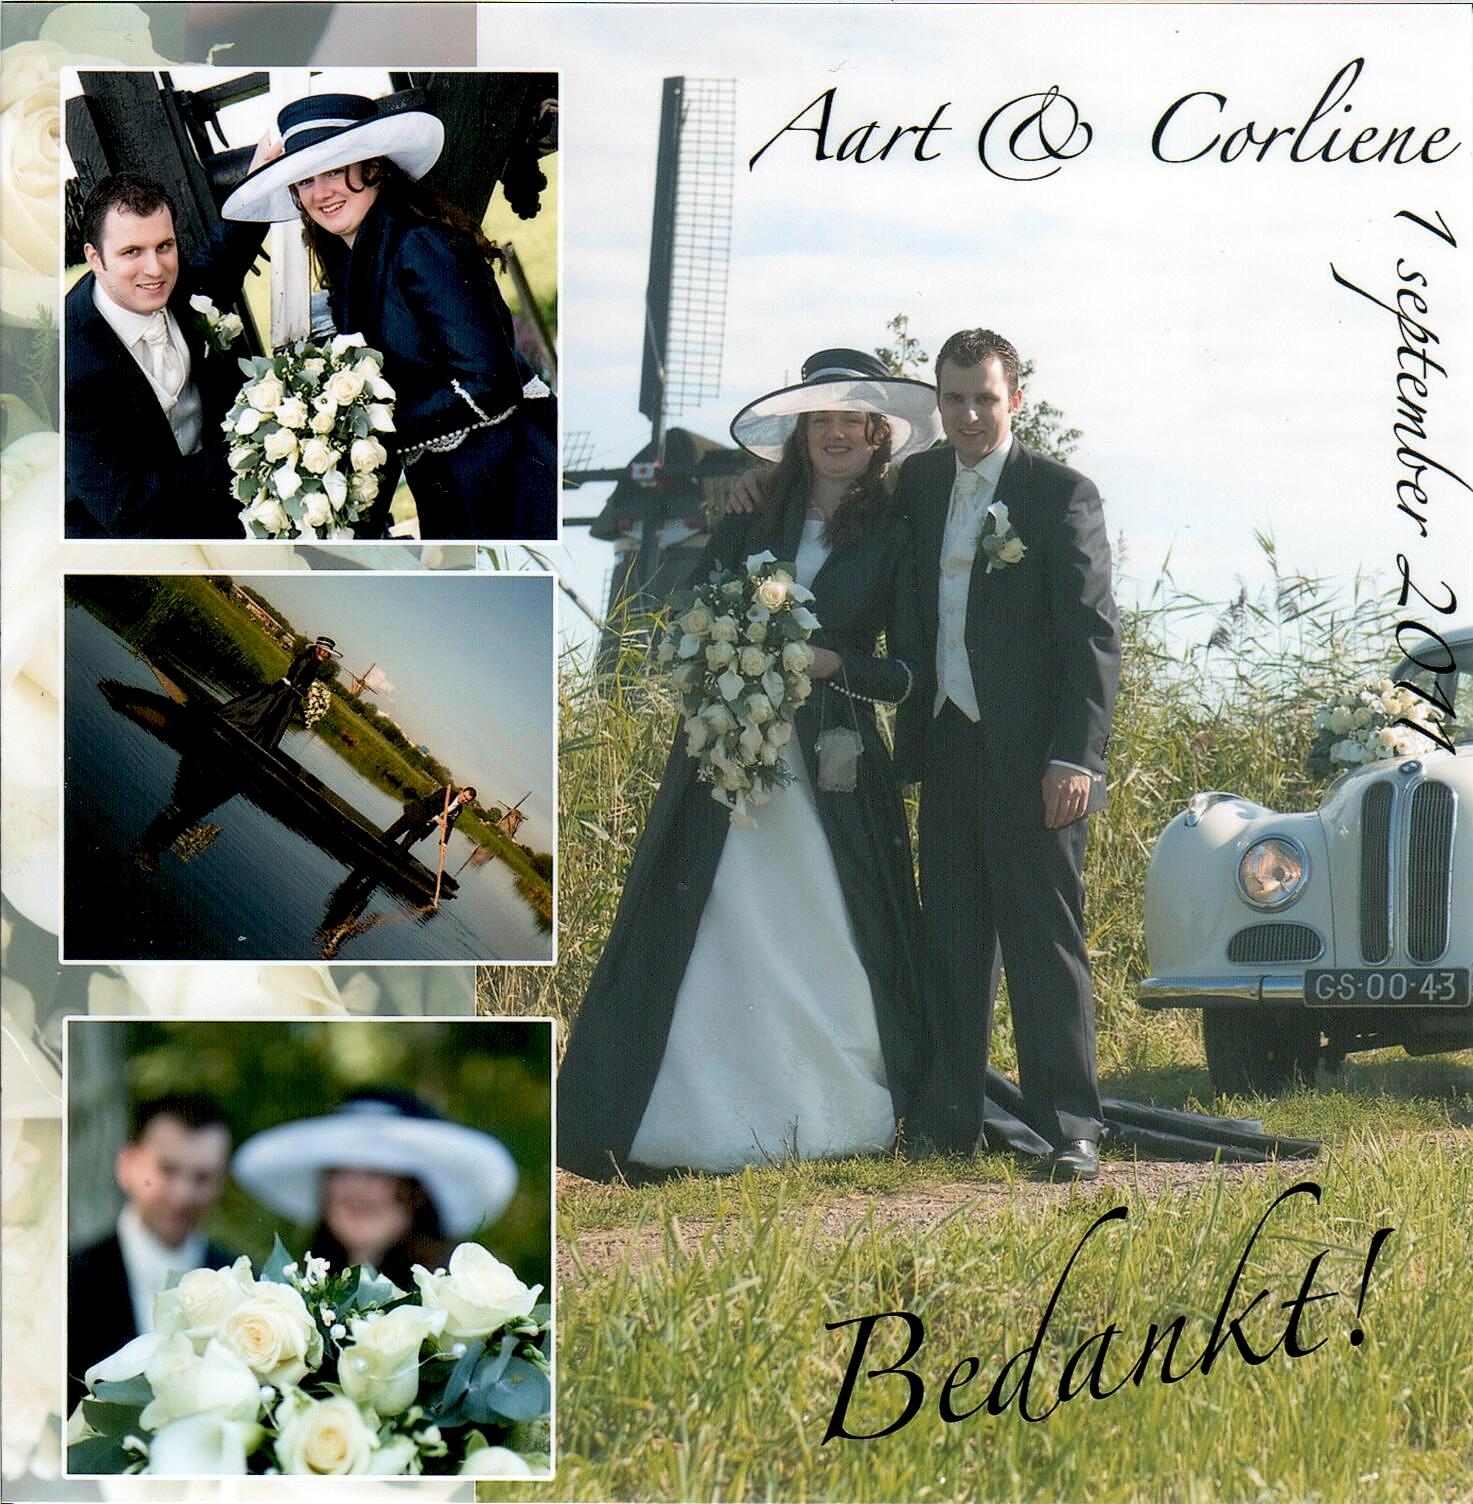 Bruidspaar Van de Hoef - van der Wal